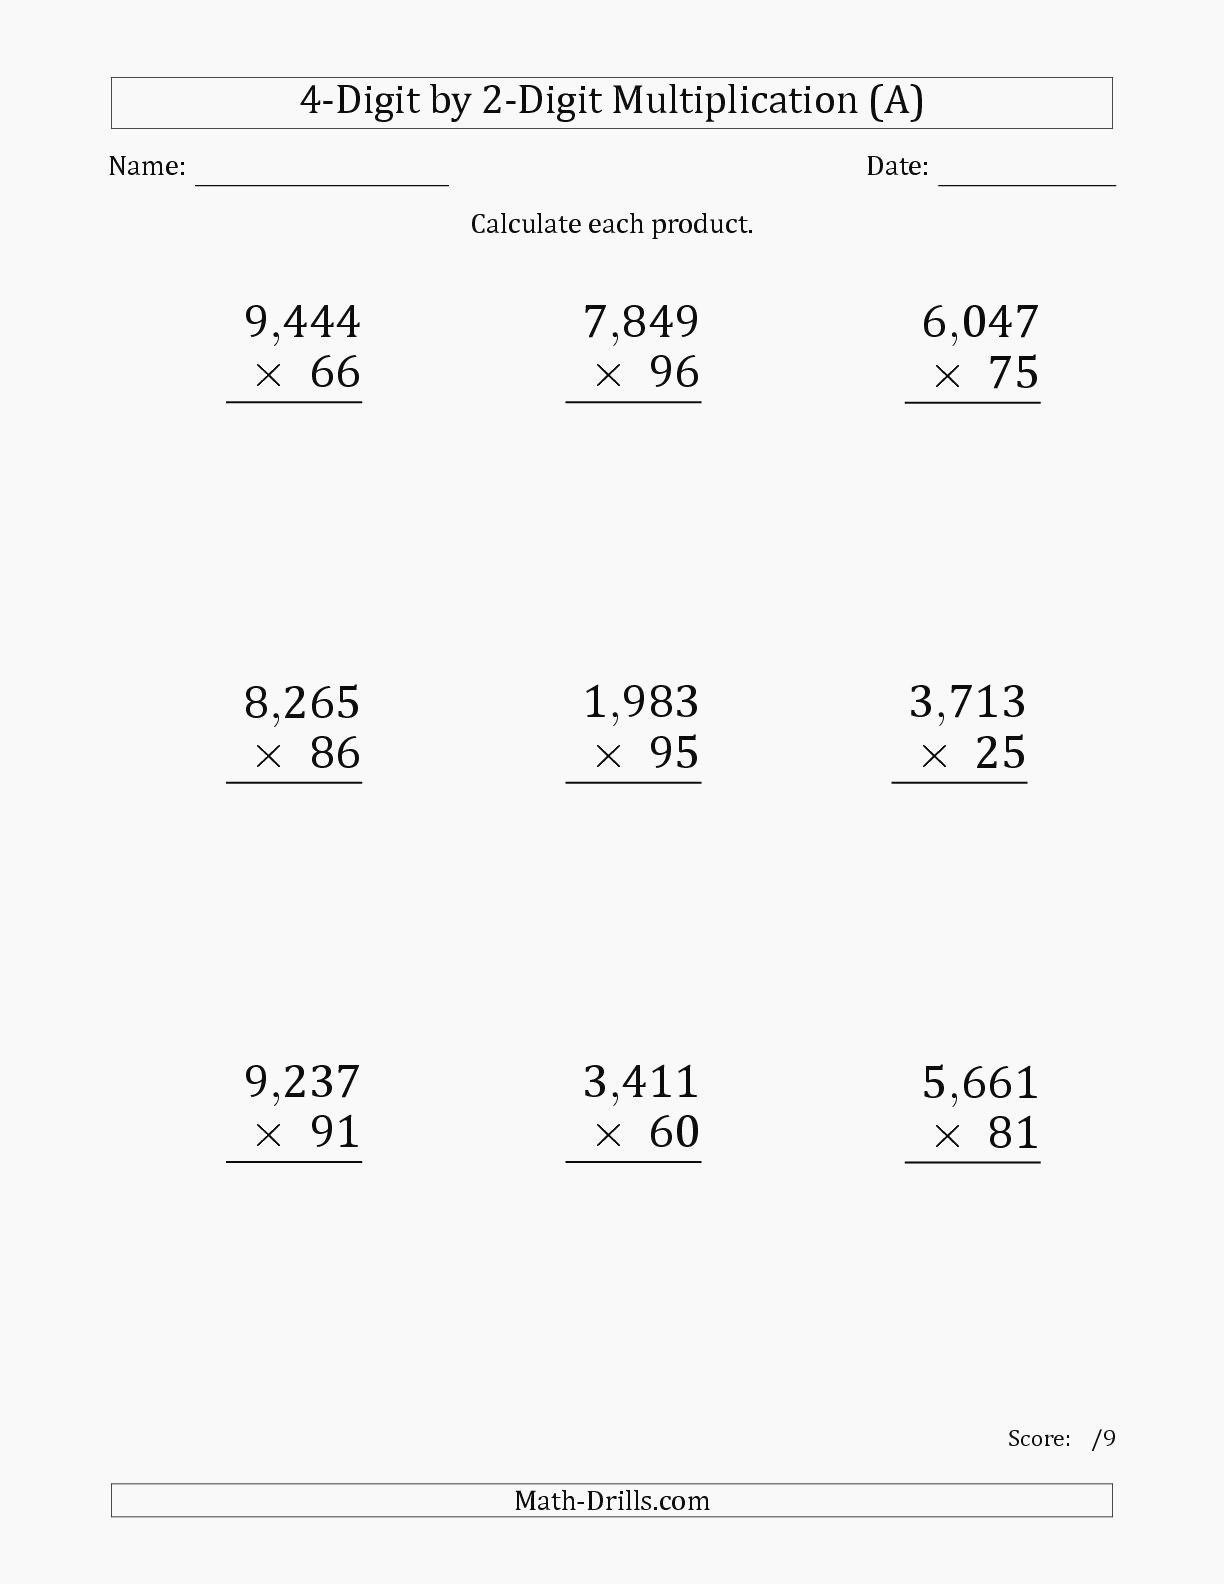 5Th Grade Multiplication Worksheets For Printable. 5Th Grade with Multiplication Worksheets 4 Digits